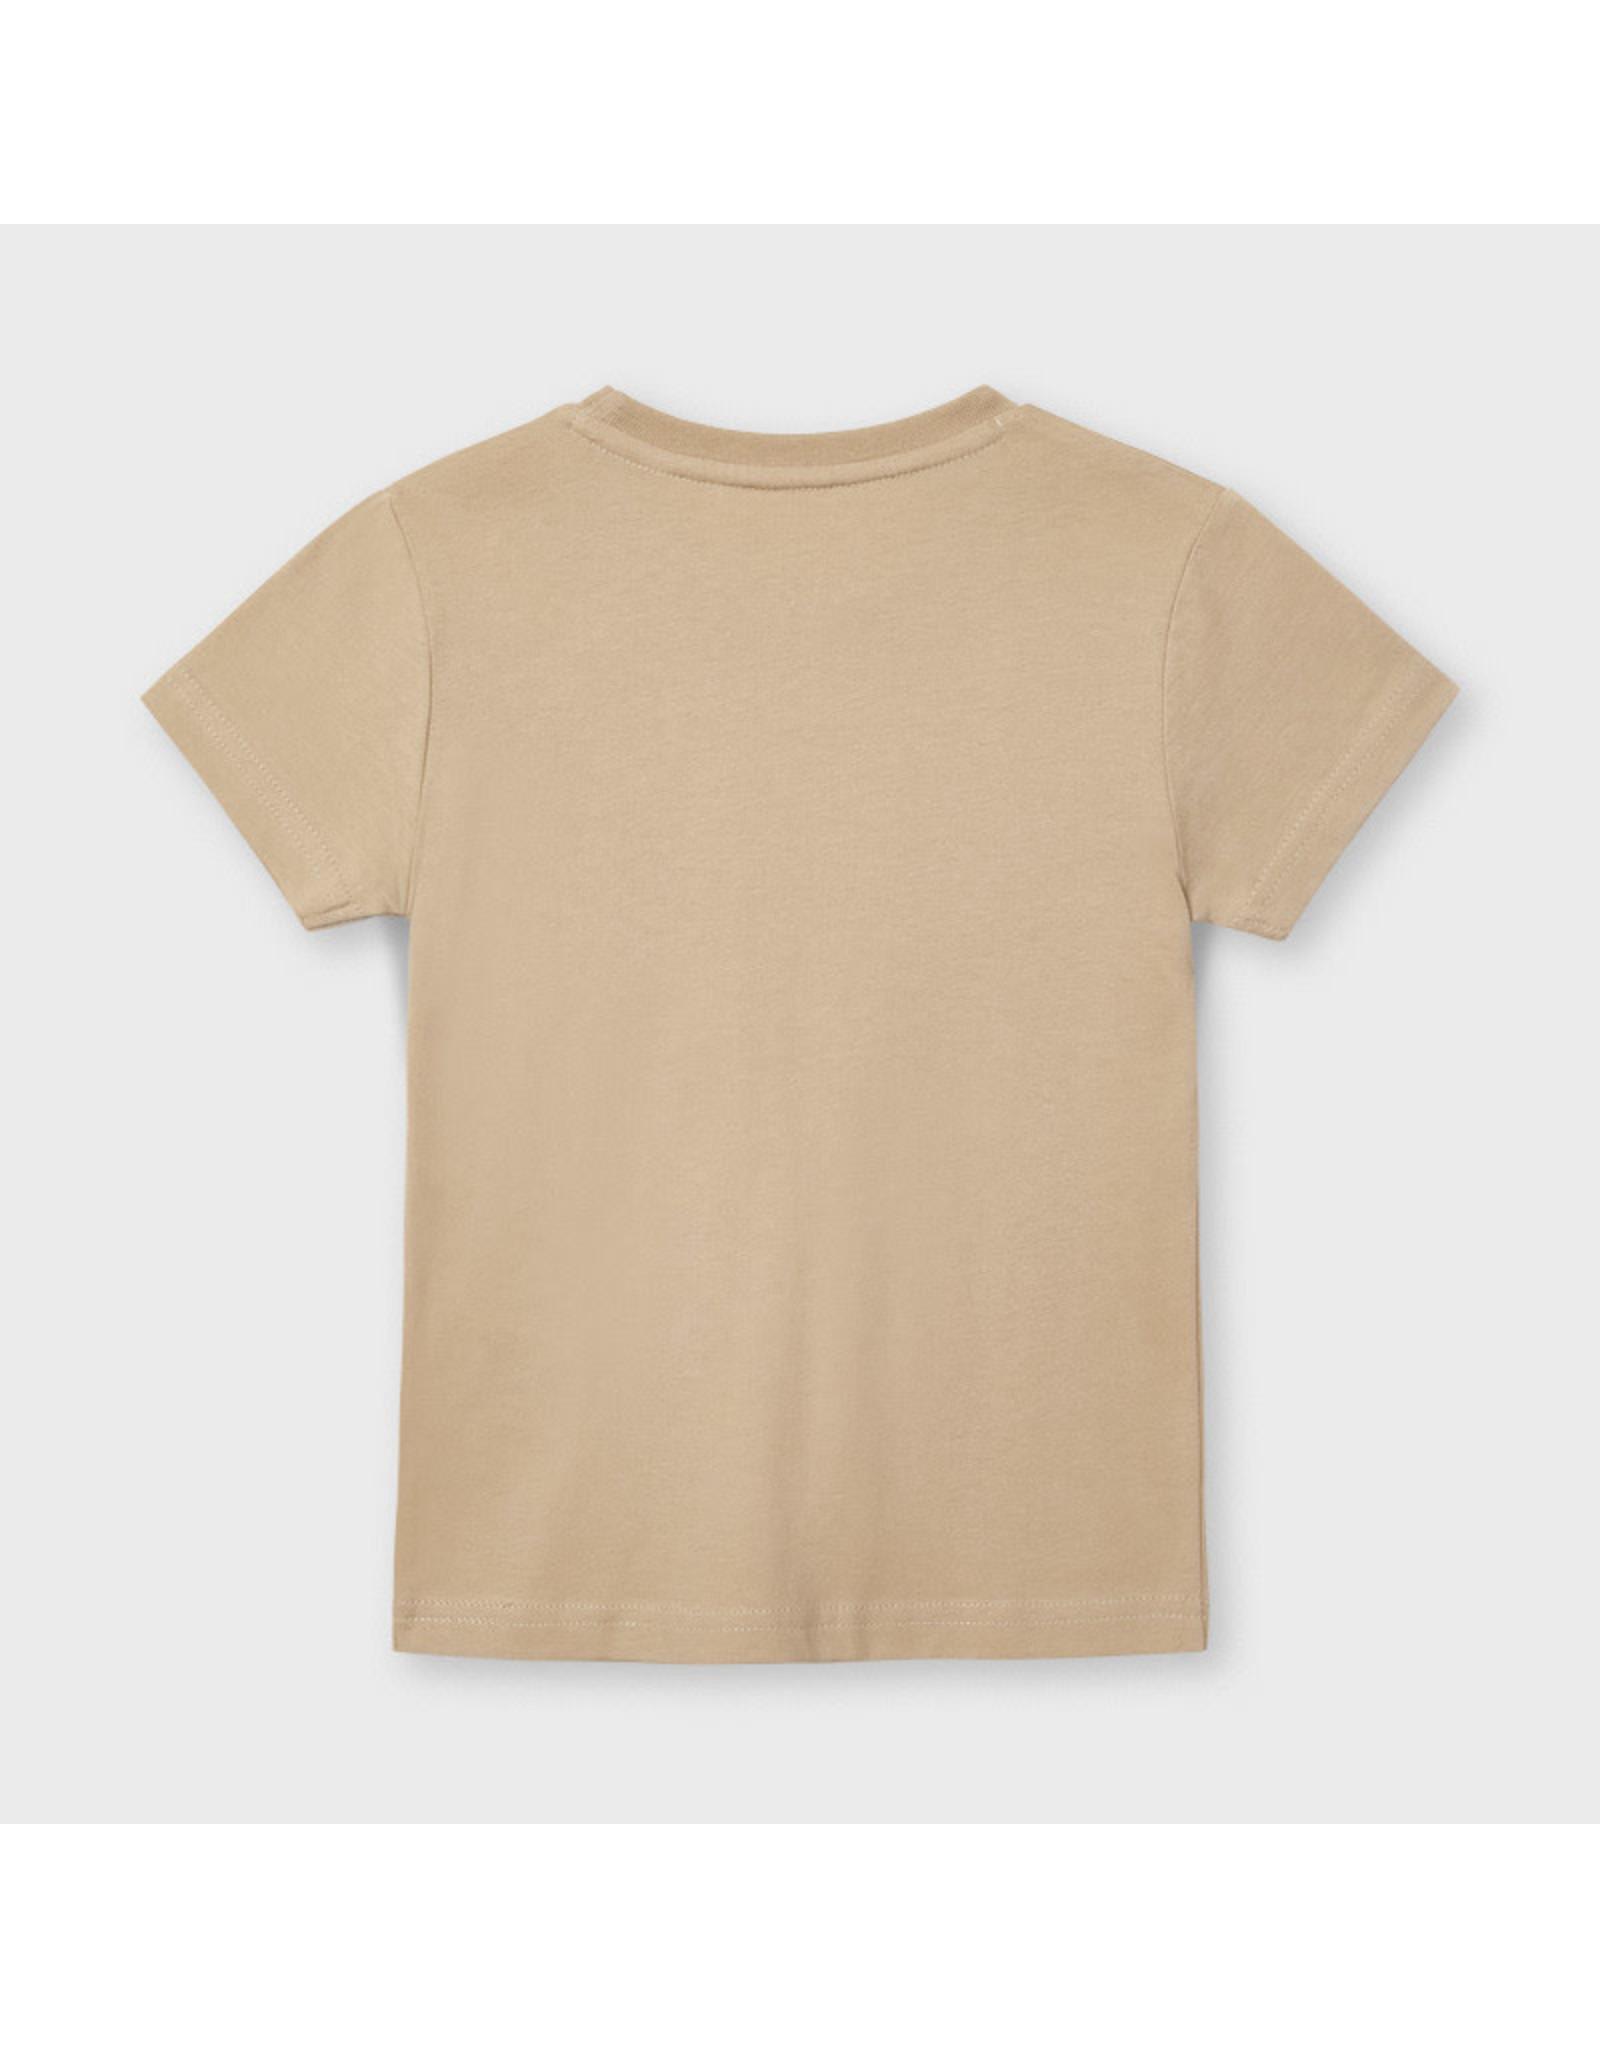 "Mayoral Short Sleeve ""Vibrations"" T-Shirt"